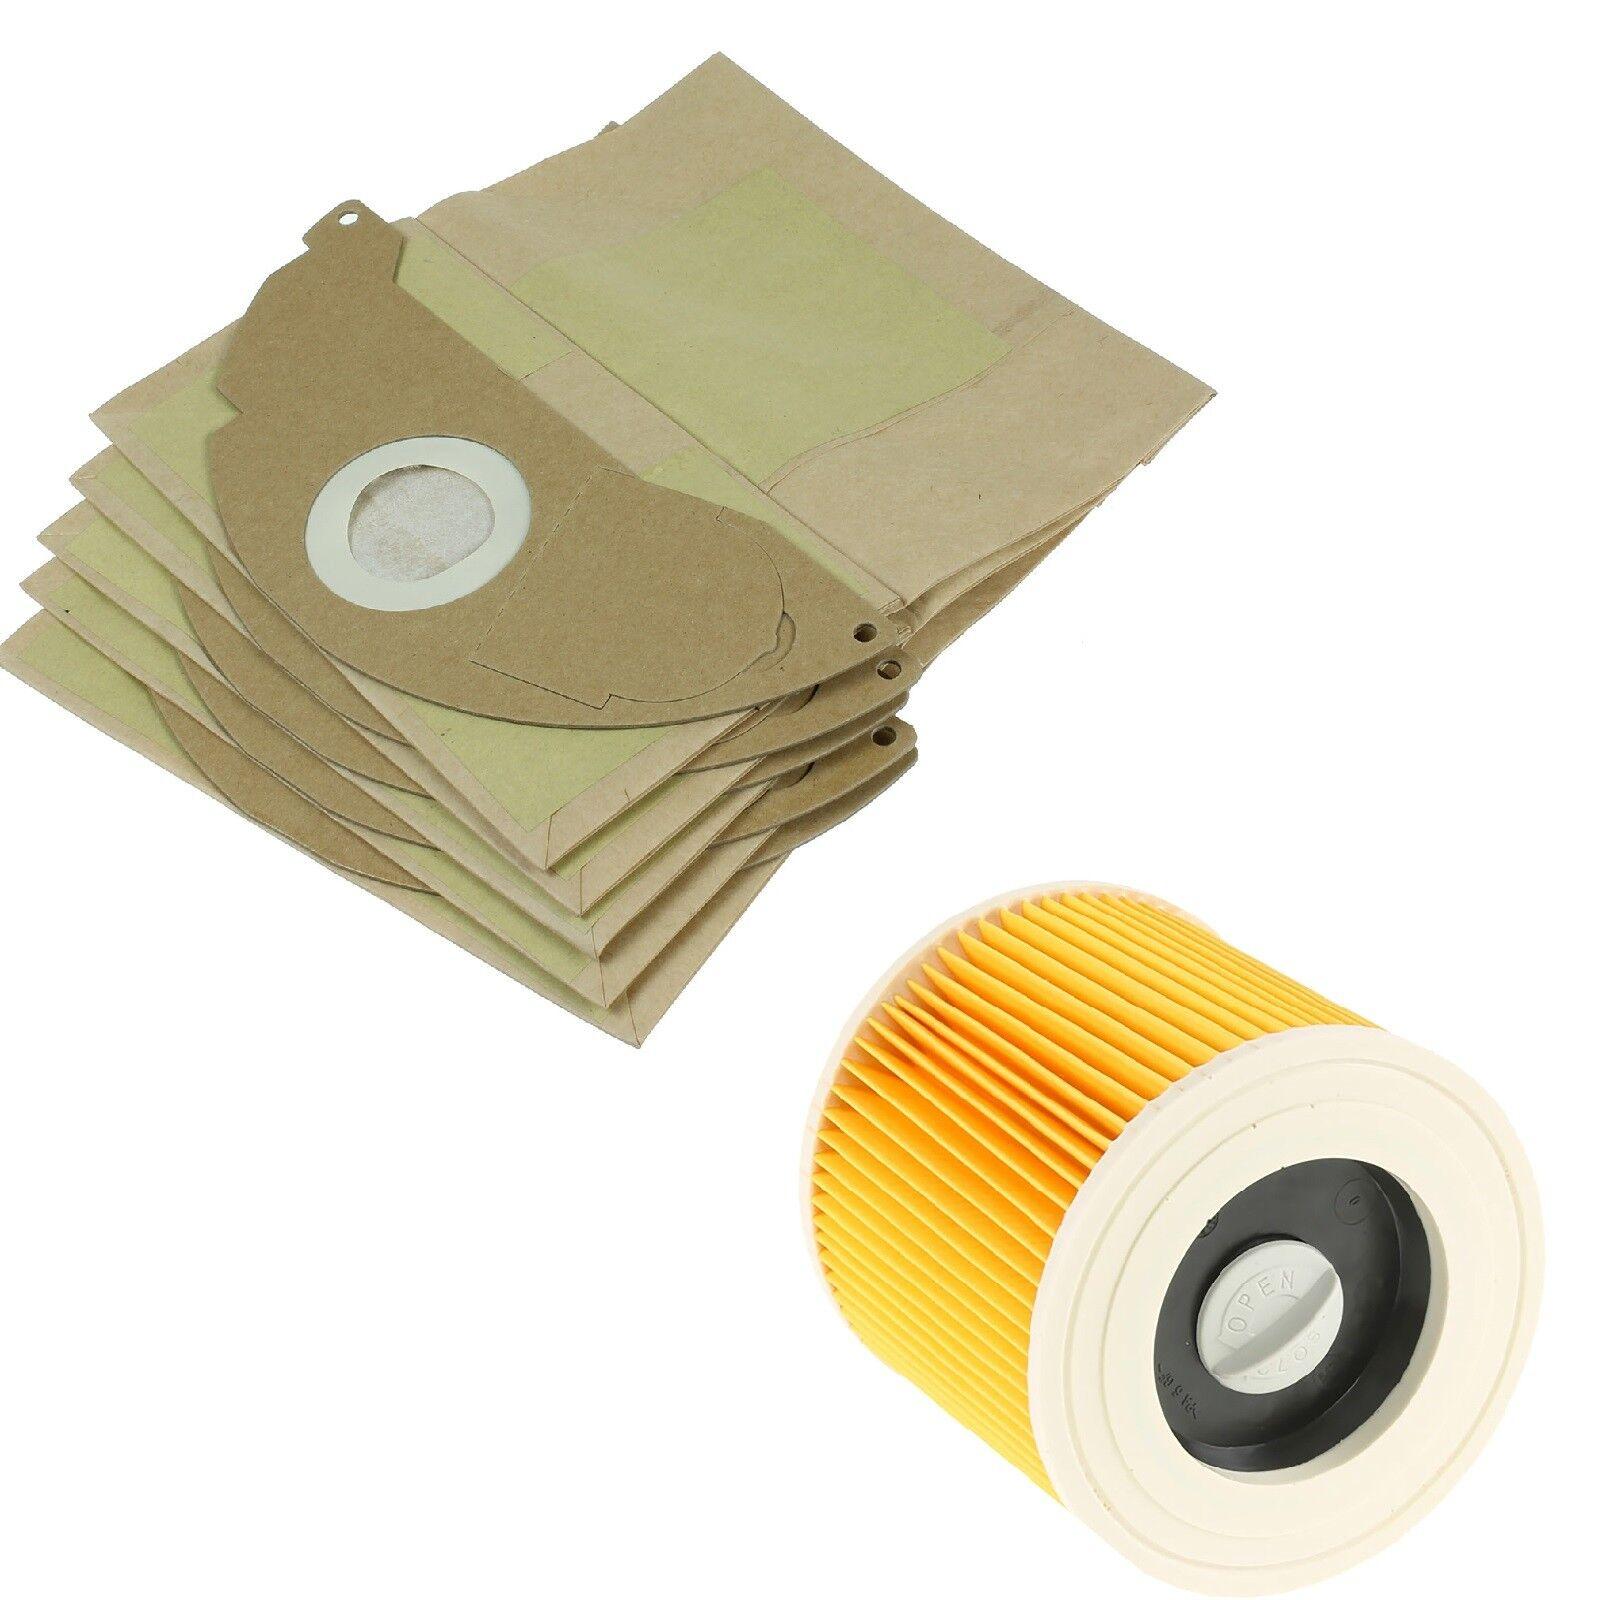 20 x Wet /& Dry Vacuum Dust Bags /& 2 Filters Fits Karcher IPX4